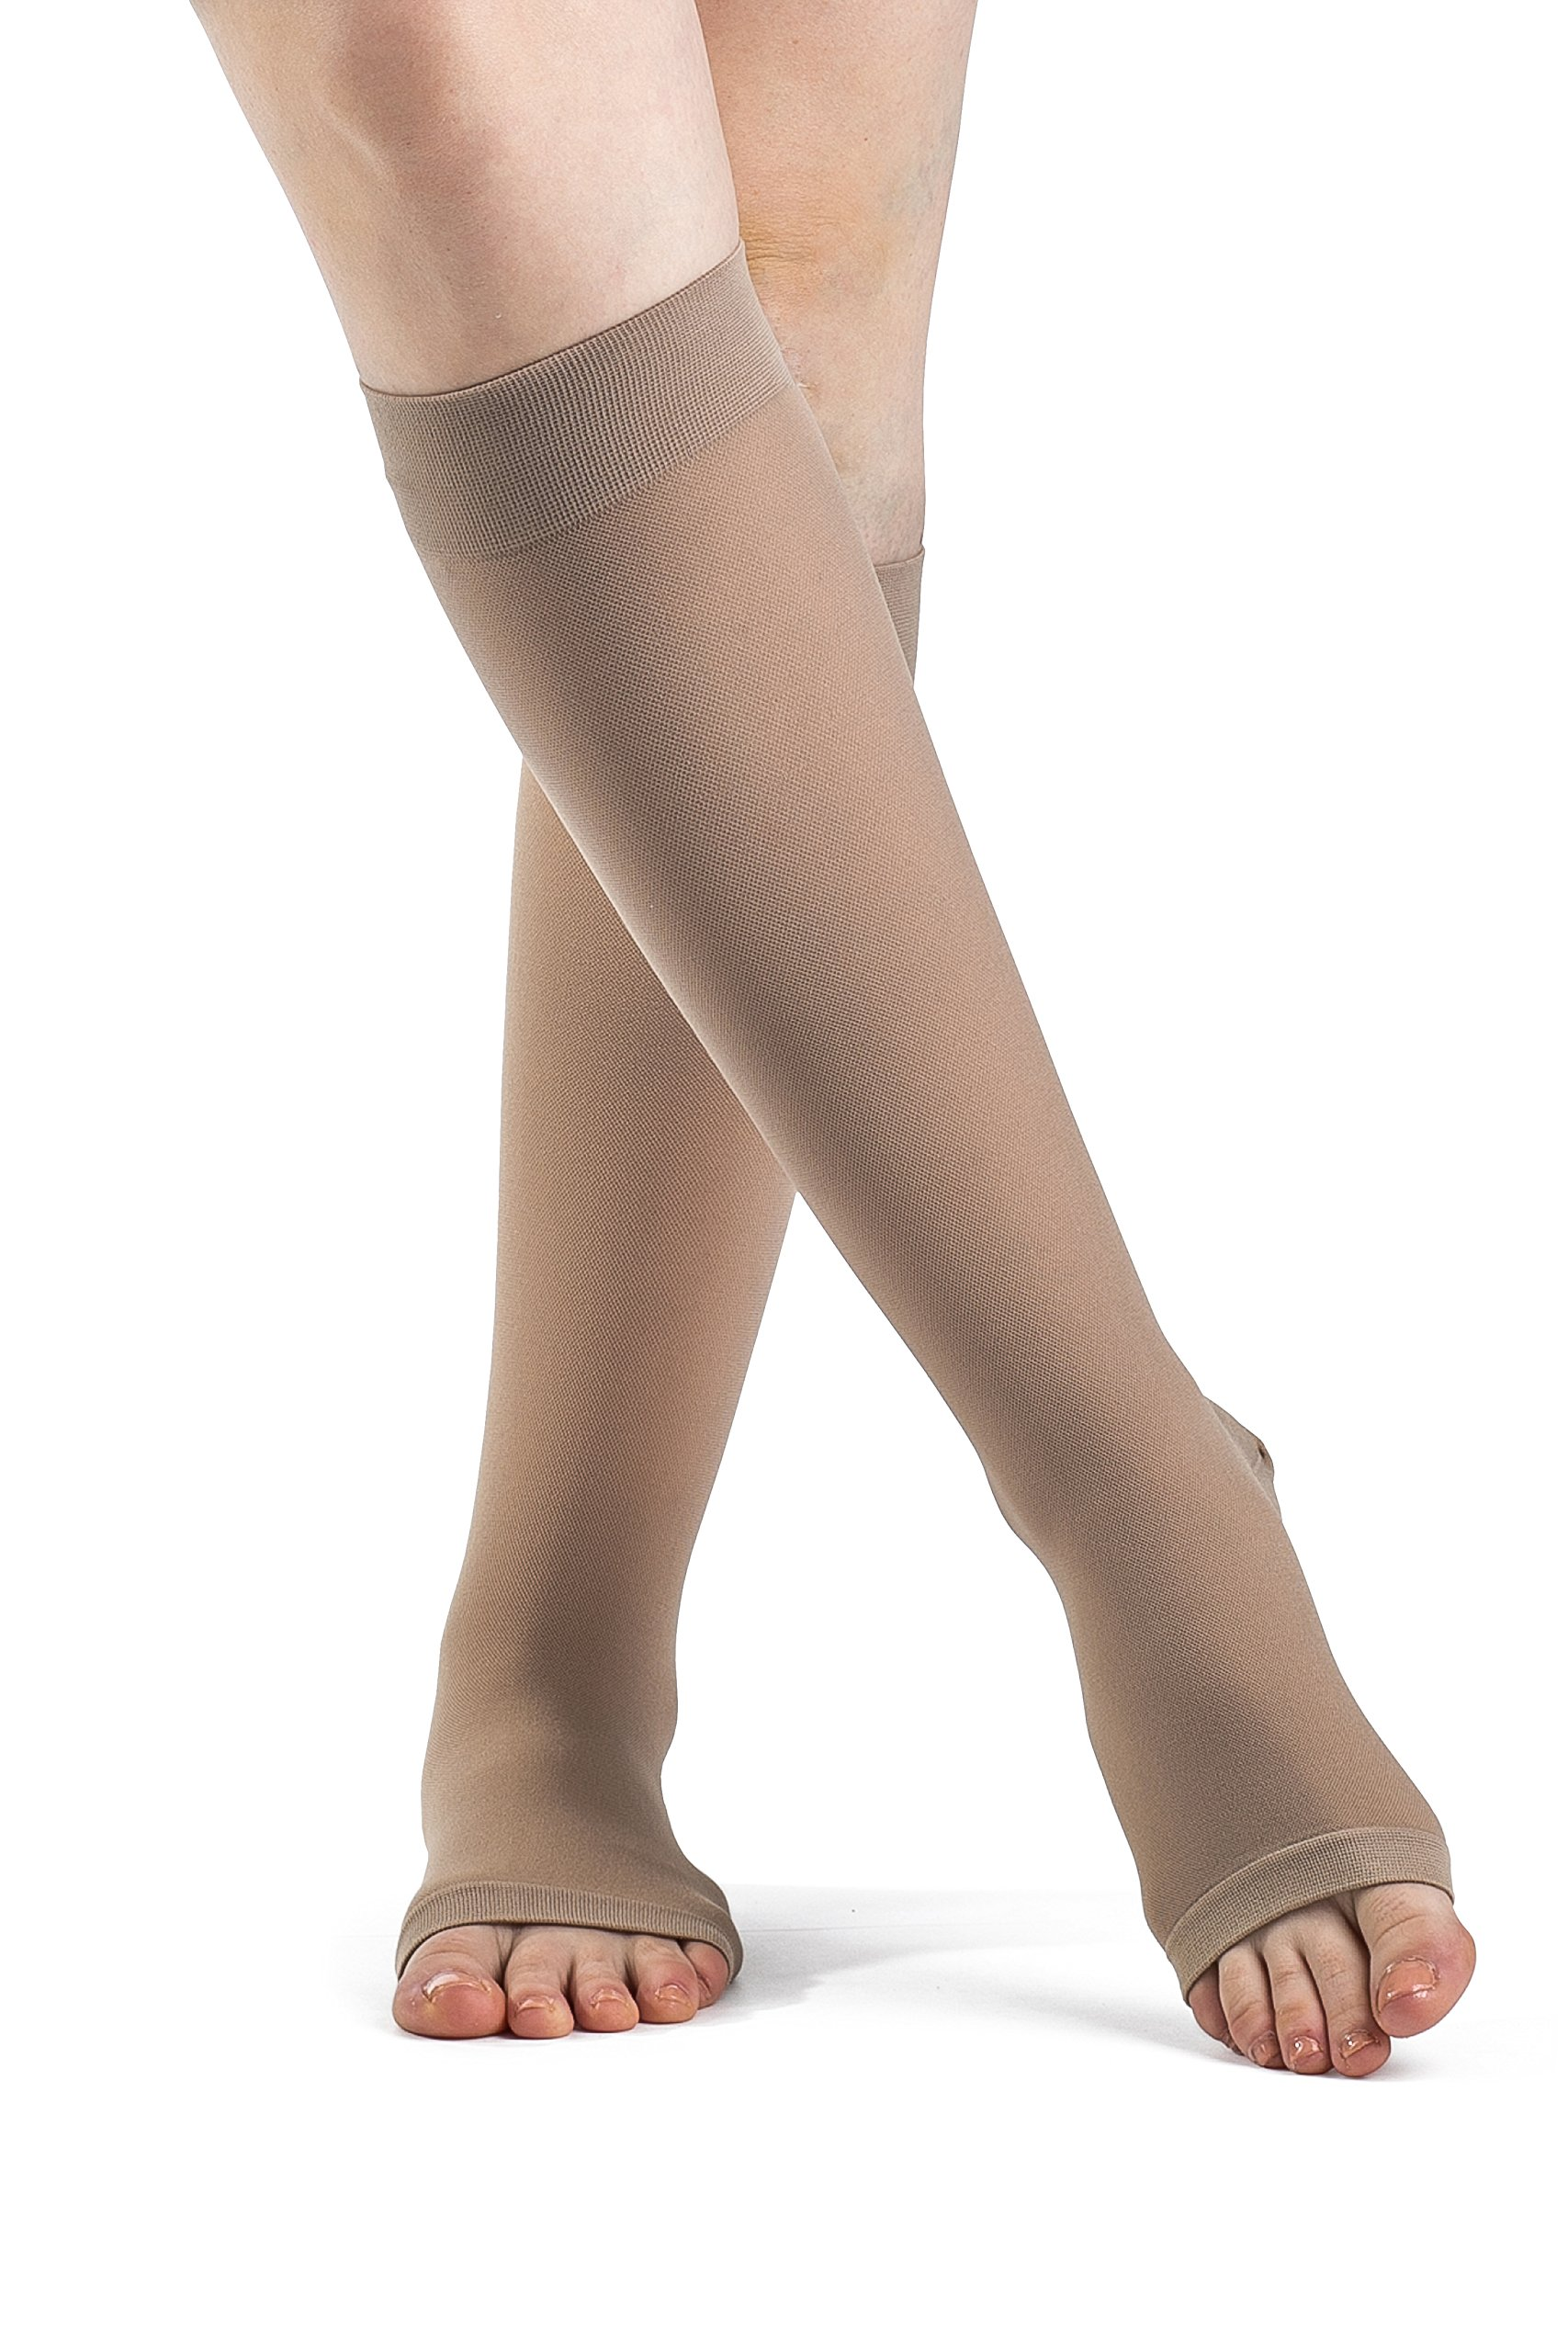 SIGVARIS Women's Access 970 Open-Toe Calf High Medical Compression 15-20mmHg